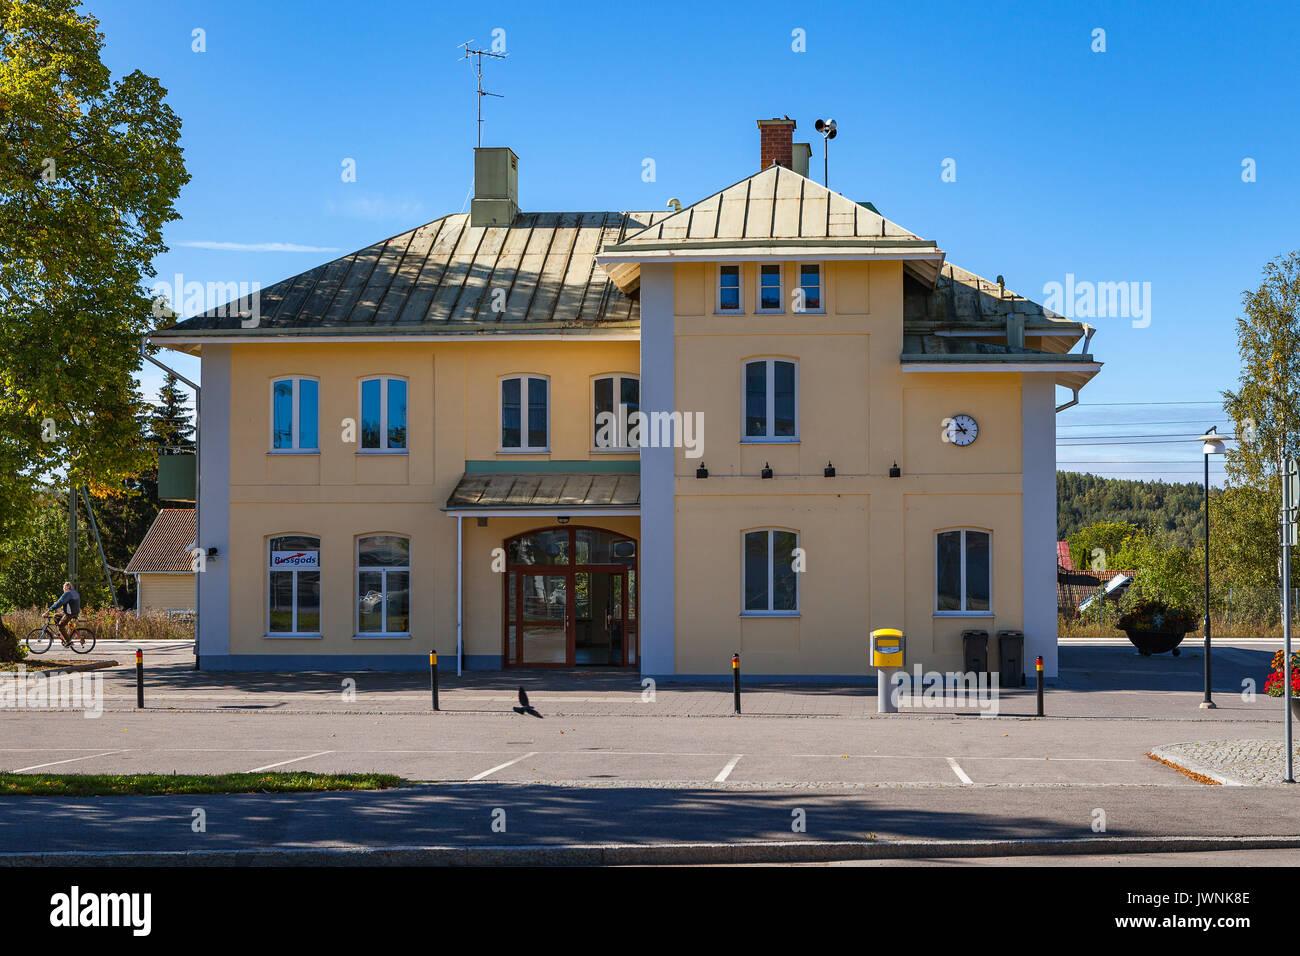 HEDEMORA, SWEDEN - SEPTEMBER, 20, 2016: Small railway station - Stock Image